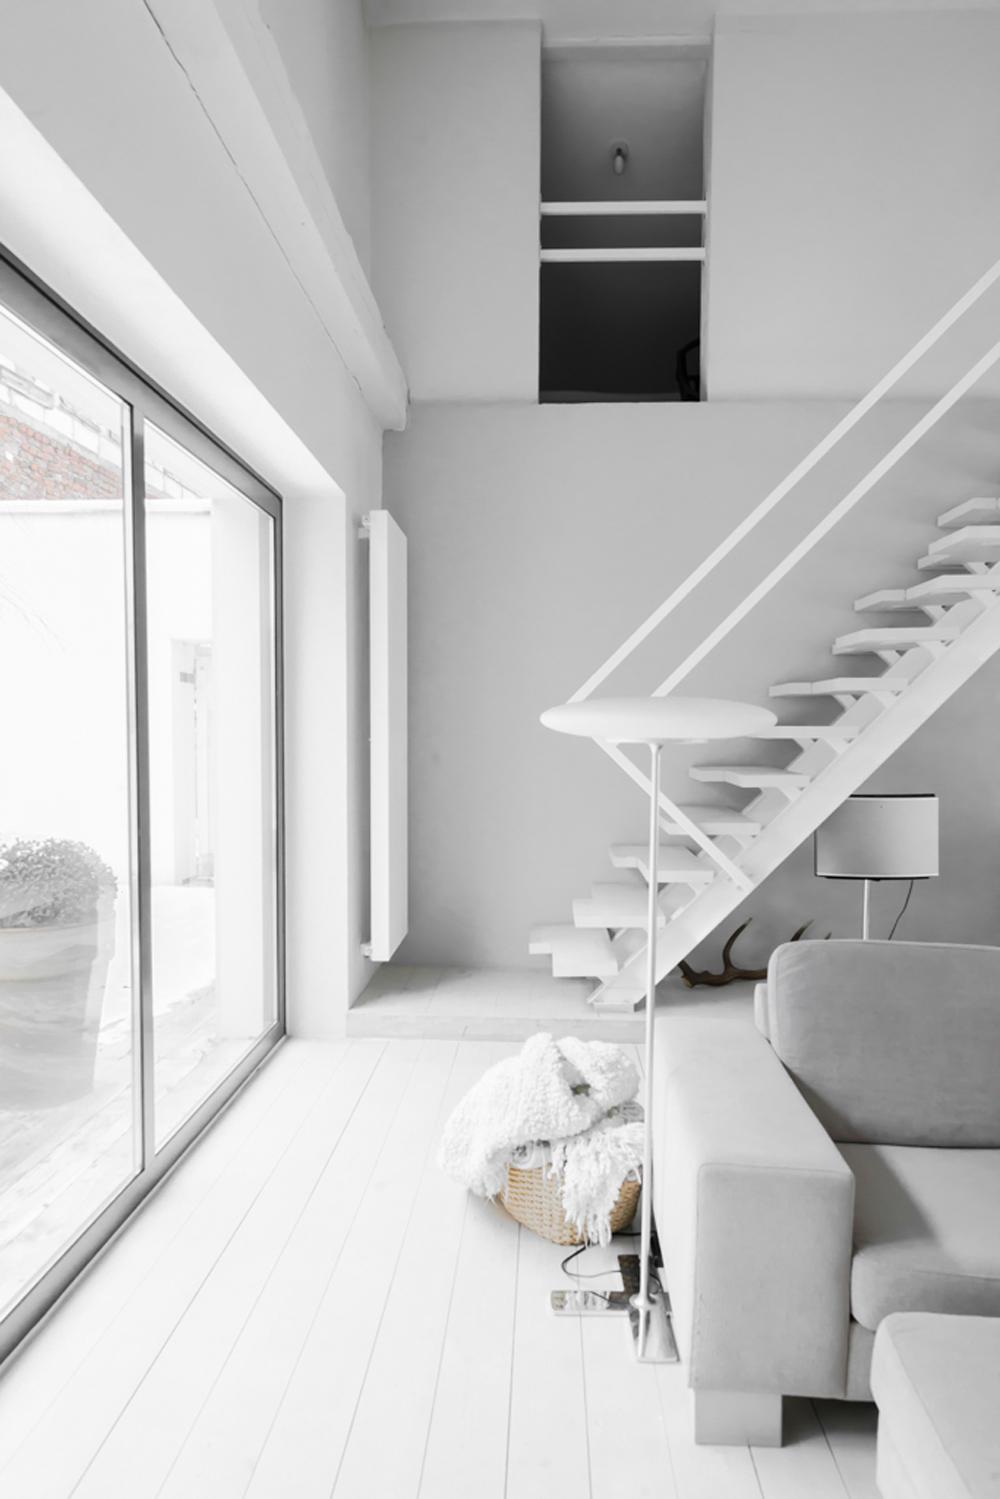 Oracle-Fox-Sunday-Sanctuary-Polish-Farmhouse-White-Minimalist-Interior-Indoor-Plants-Scandinavian-Style-29